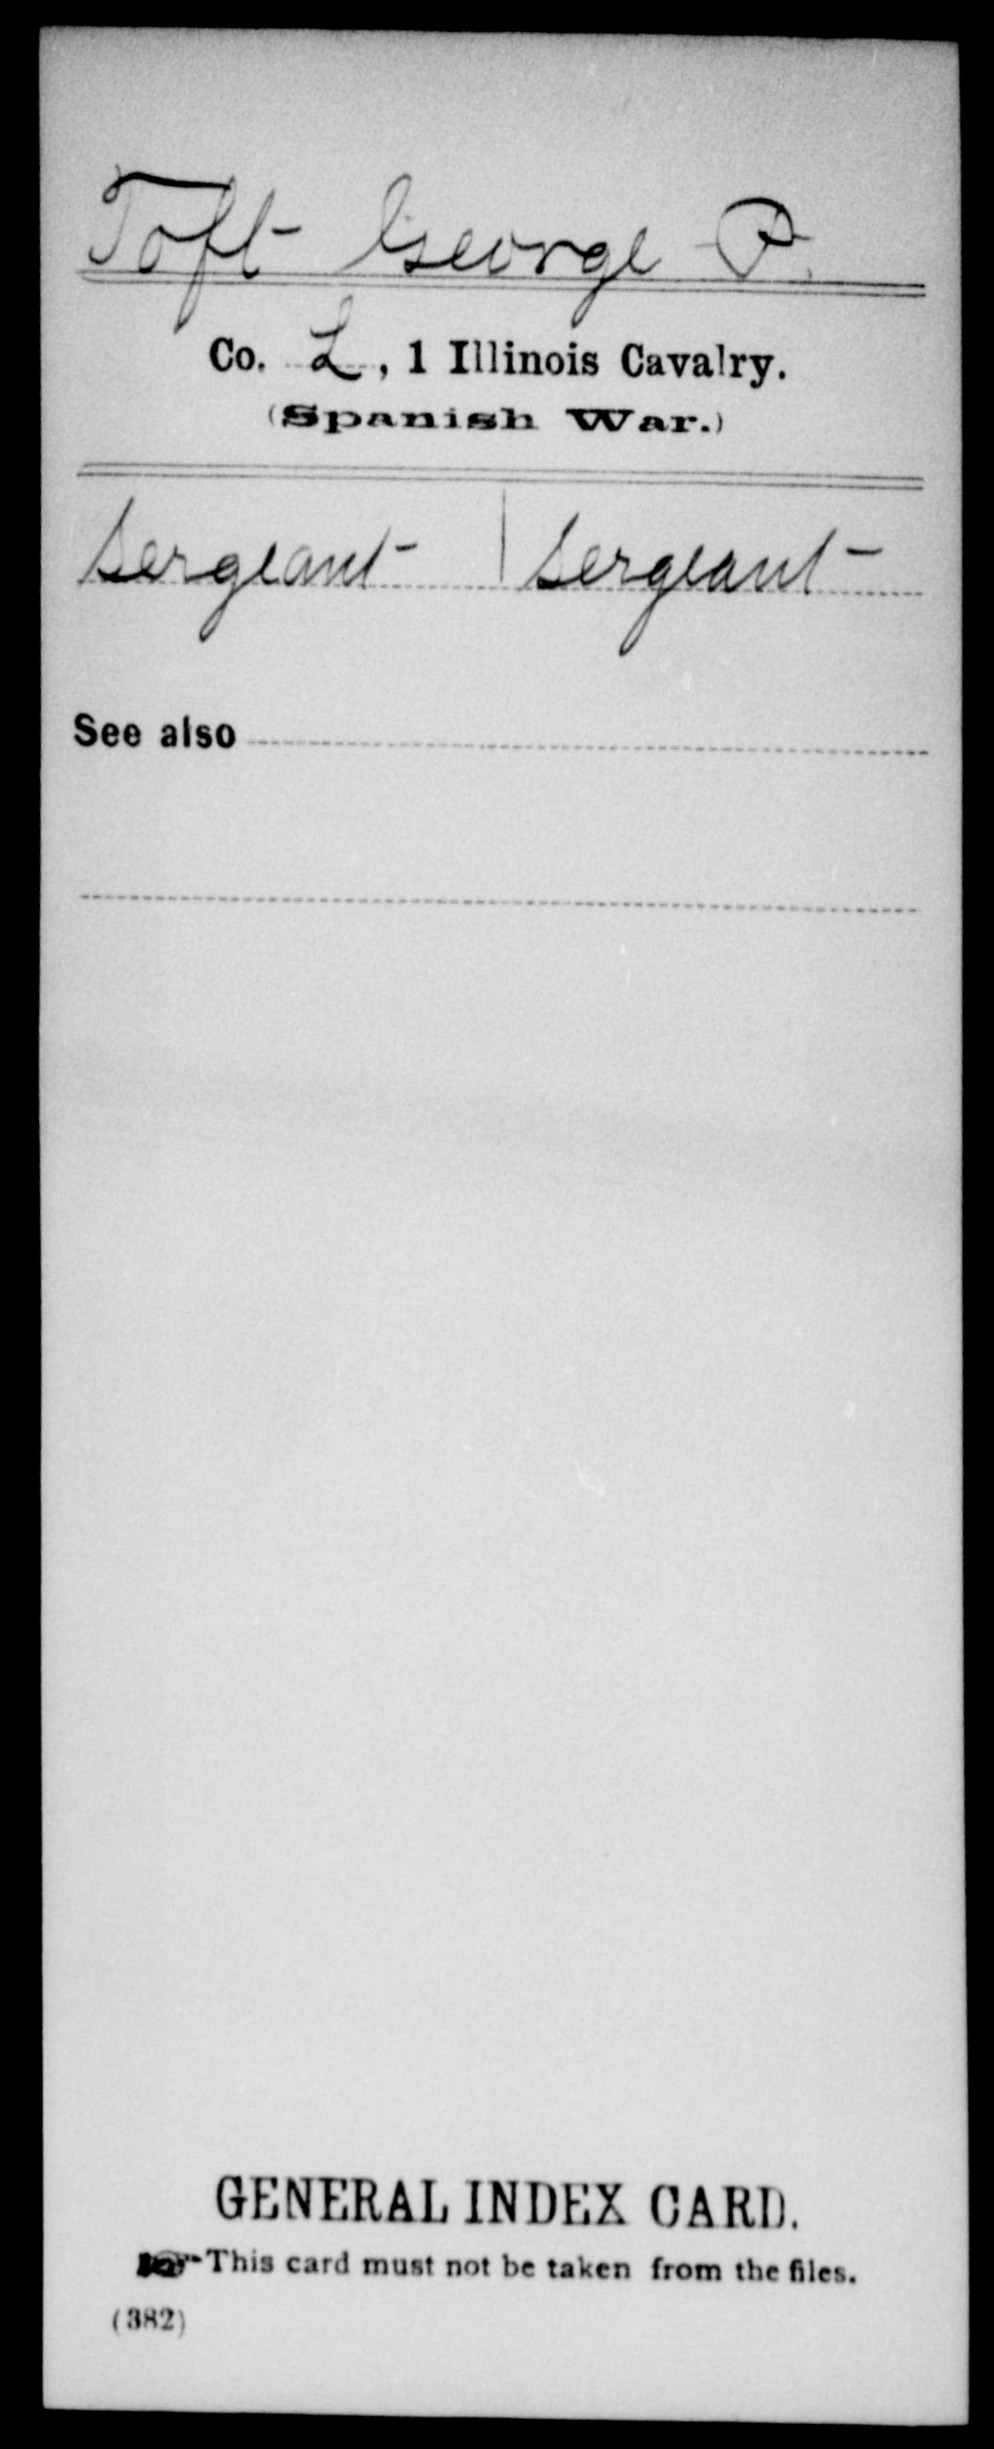 Toft, George P - State: Illinois - Regiment: 1 Illinois Cavalry, Company L